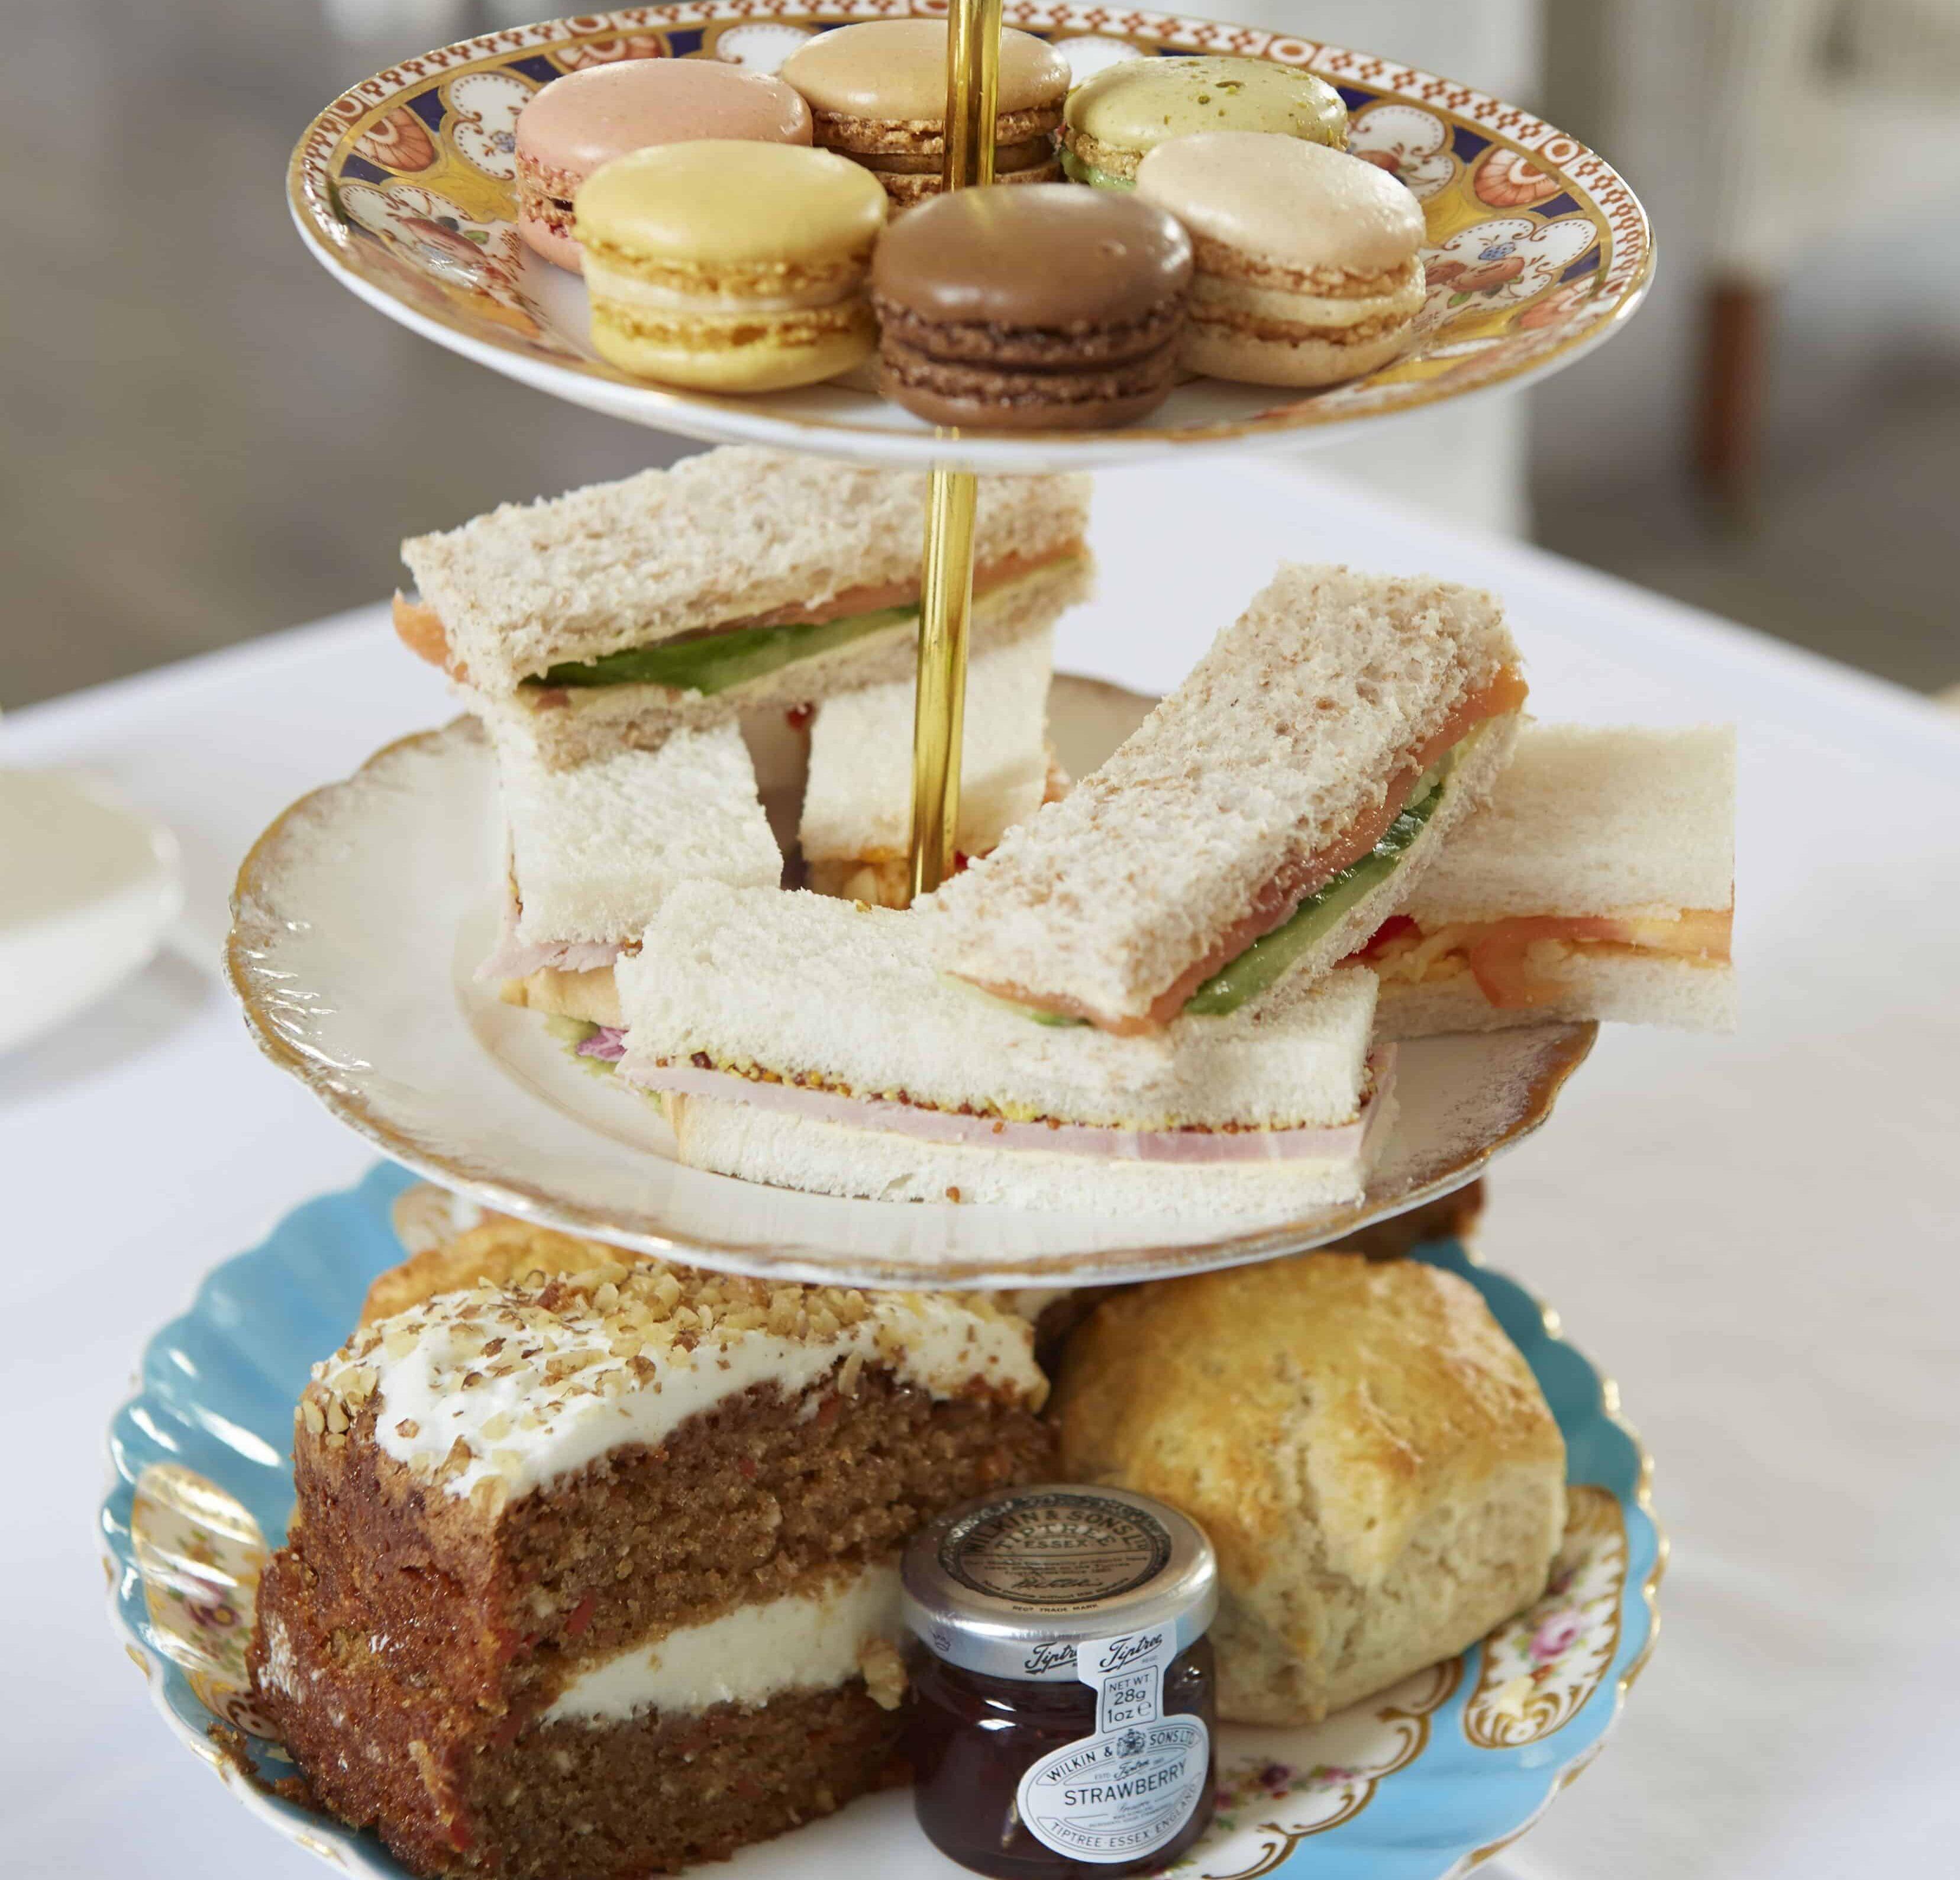 Afternoon Tea at Lemore Manor